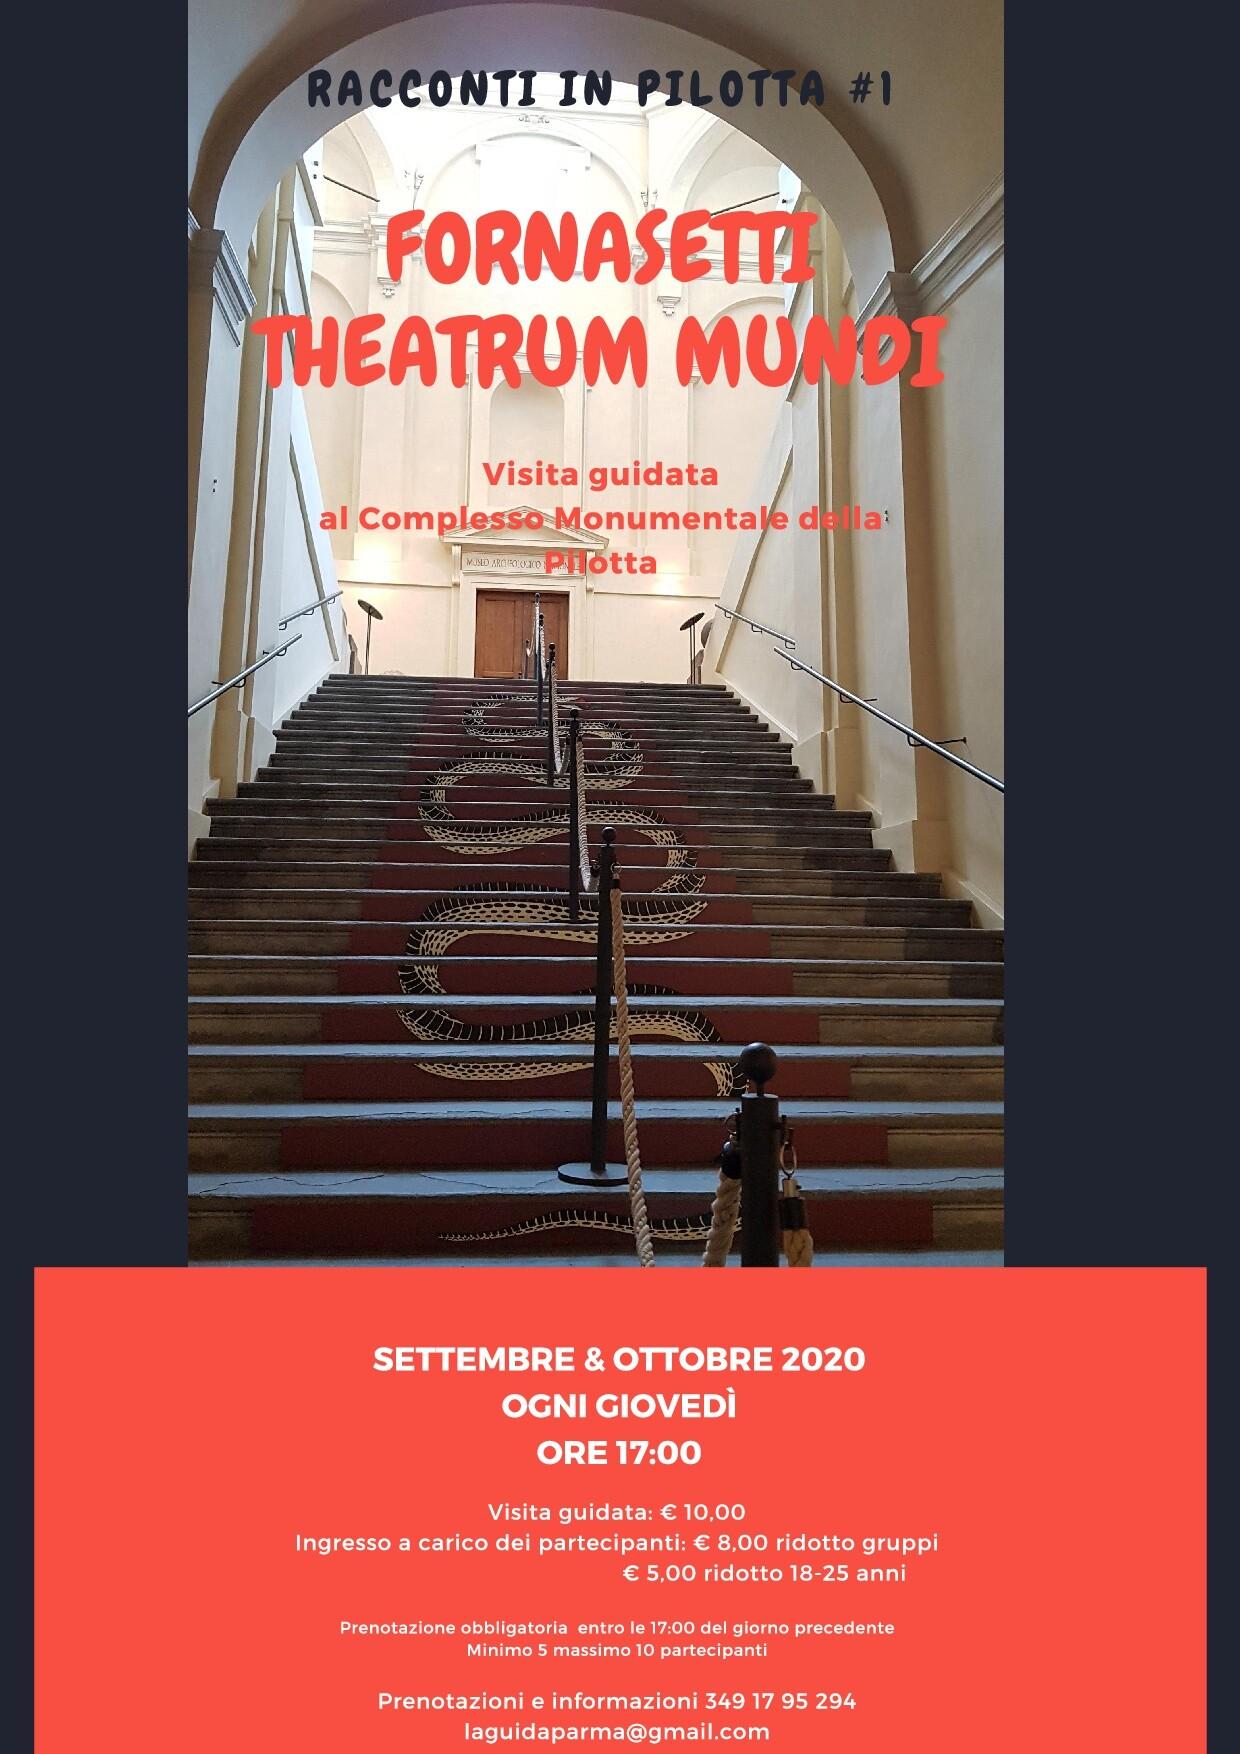 Visite guidate alla mostra Fornasetti Theatrum Mundi in Pilotta